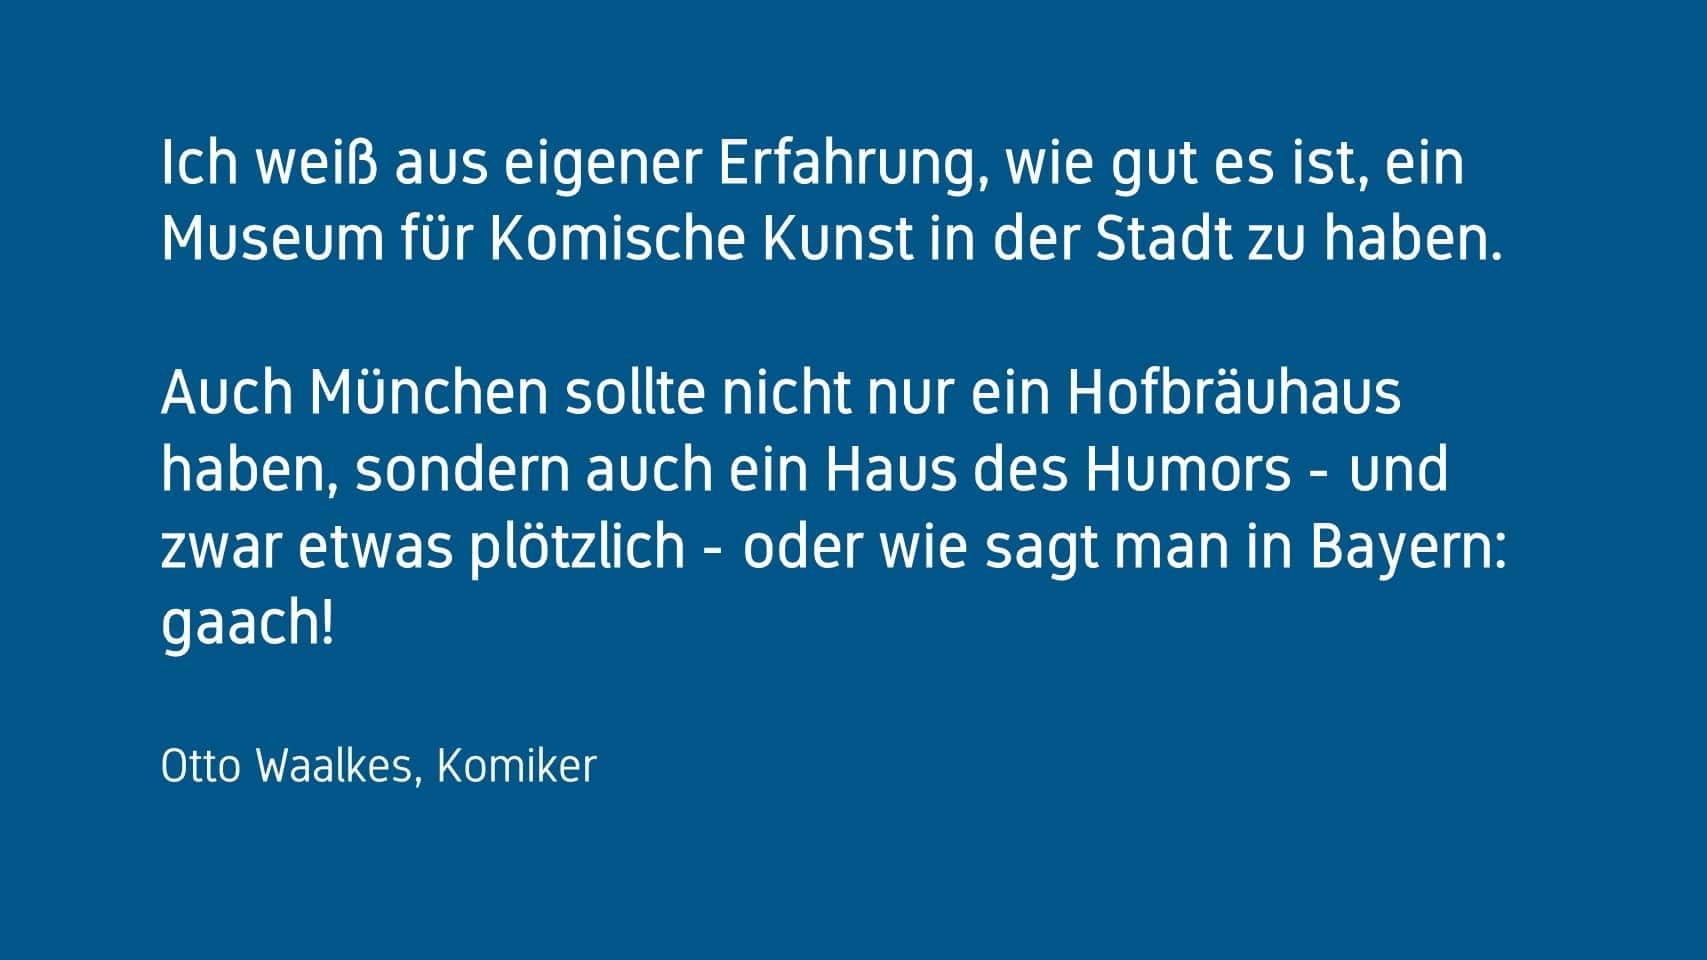 Otto Waalkes Forum Humor